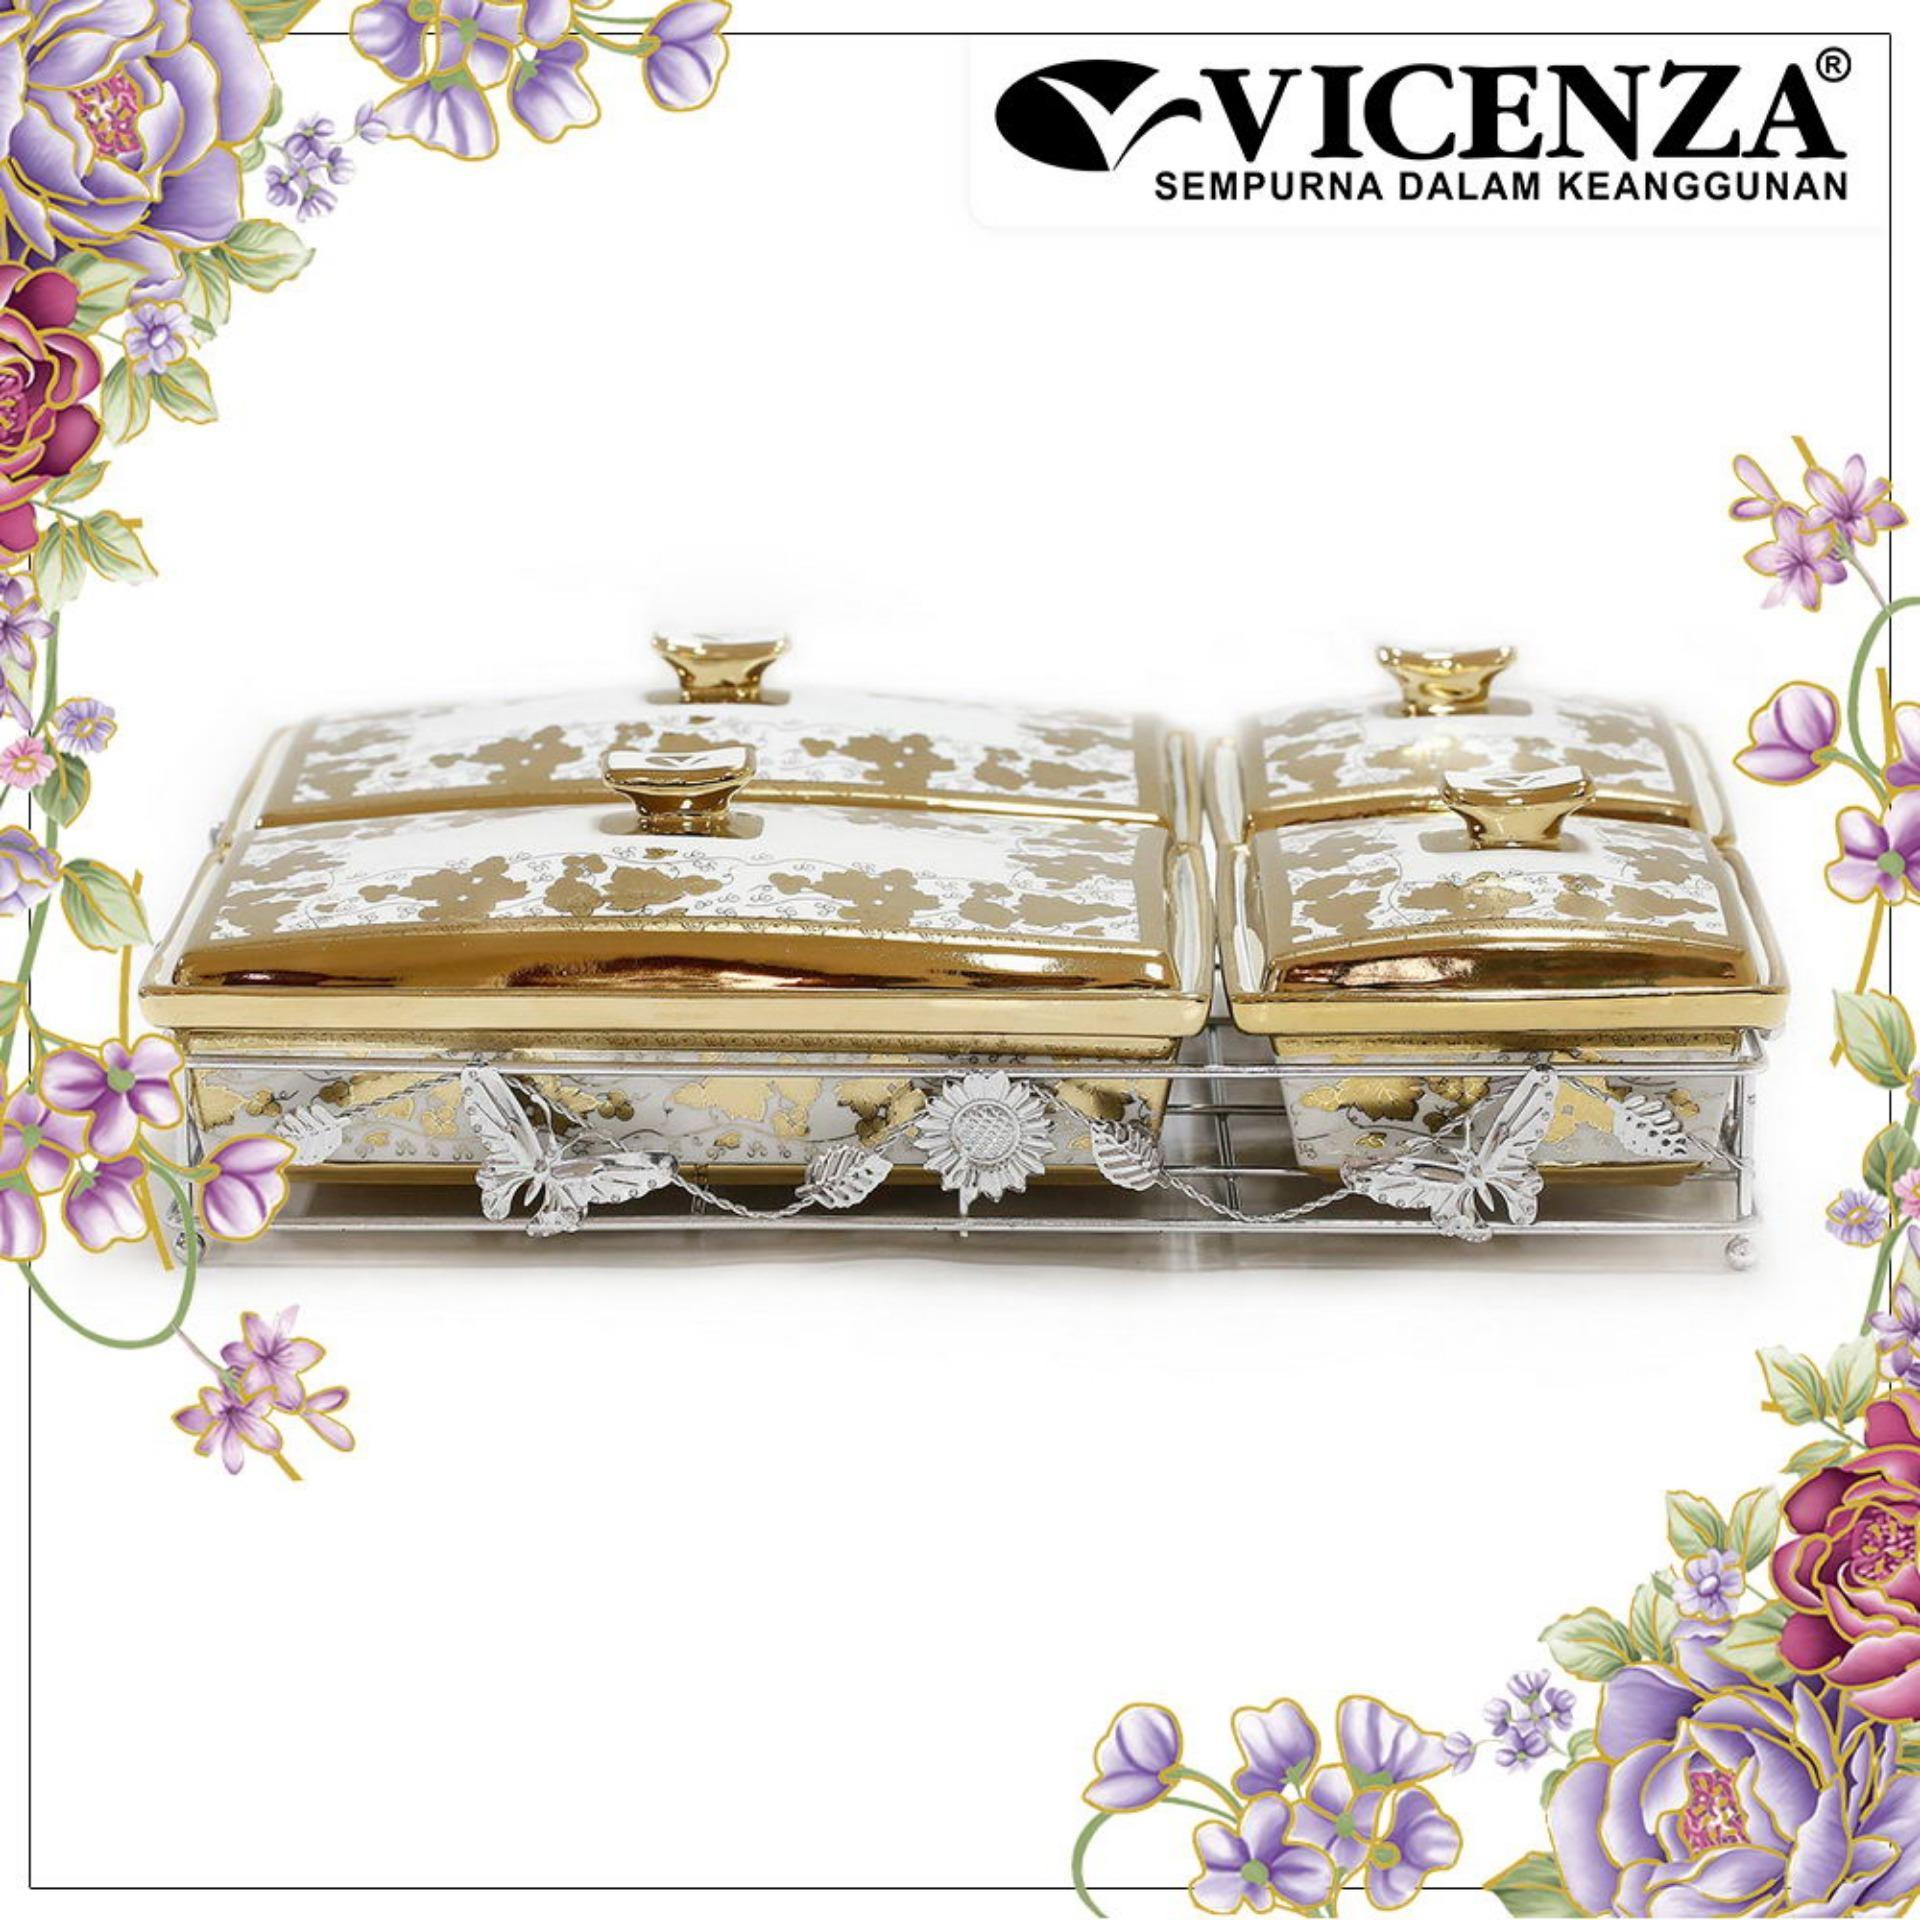 Jual Beli Online Vicenza Tableware Cr749 Wadah Saji Makanan Snack Multi Casserole